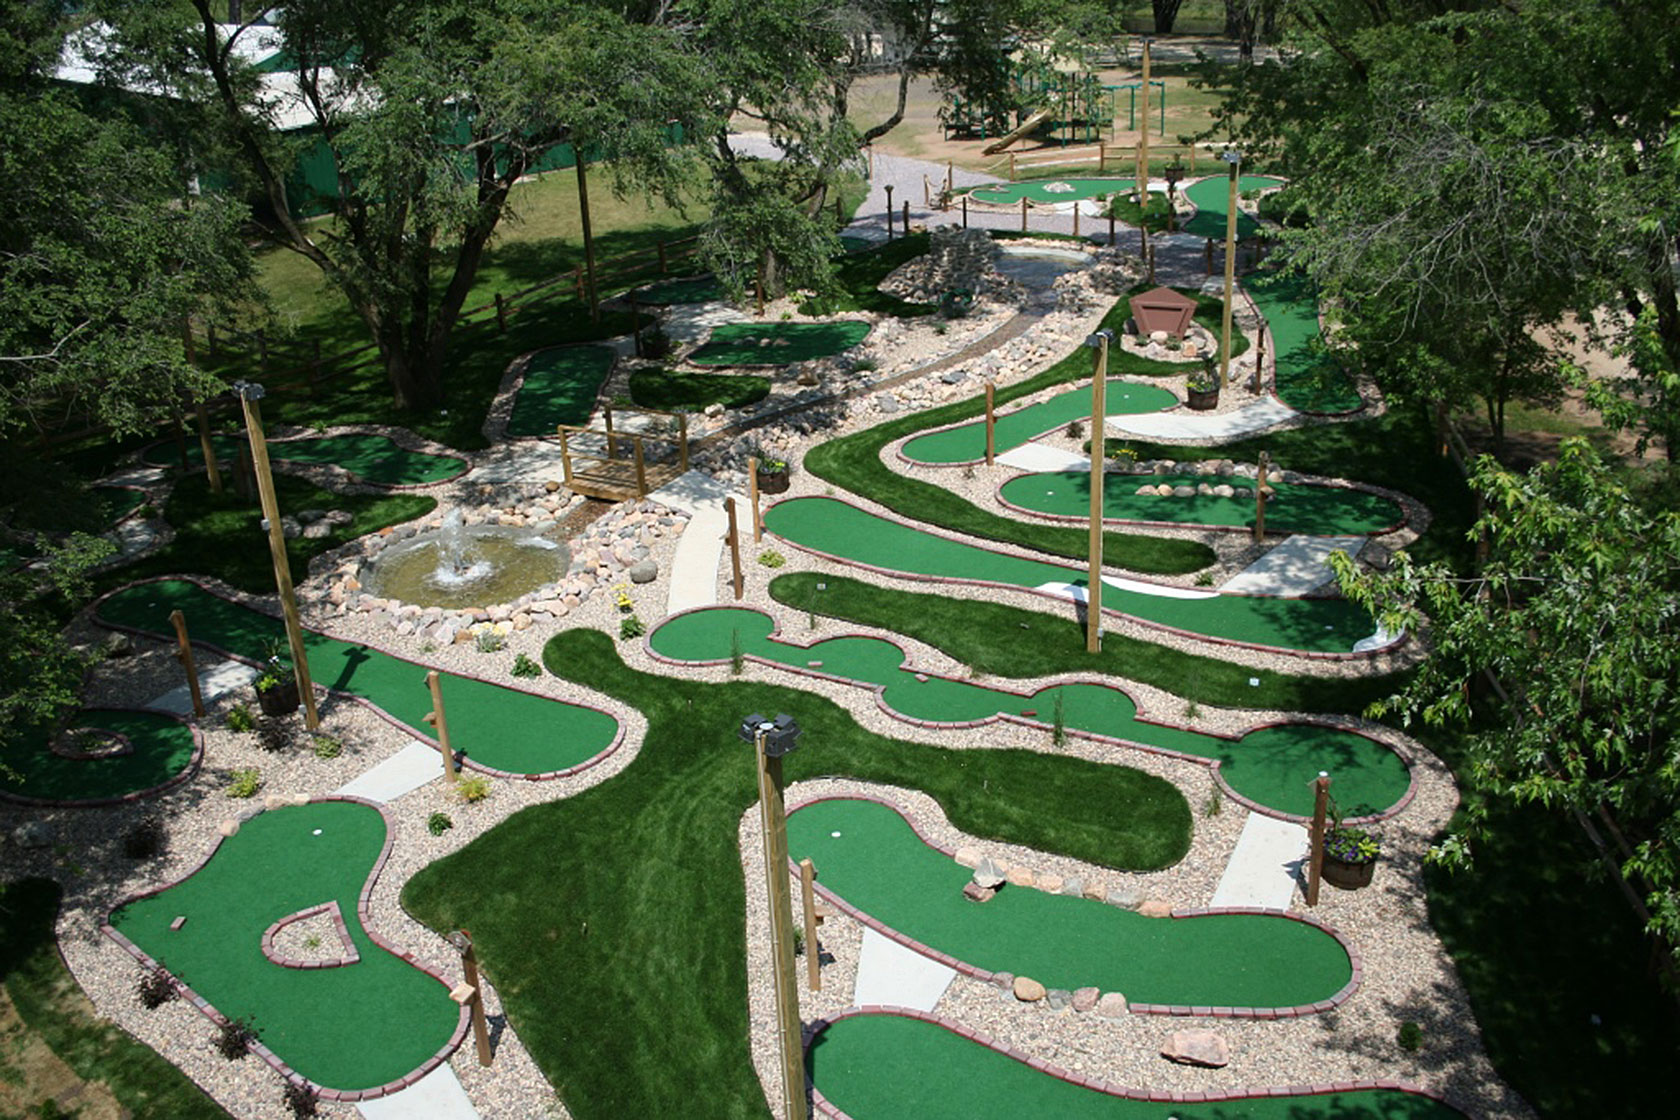 Adventure-Style Miniature Golf - Commercial Recreation